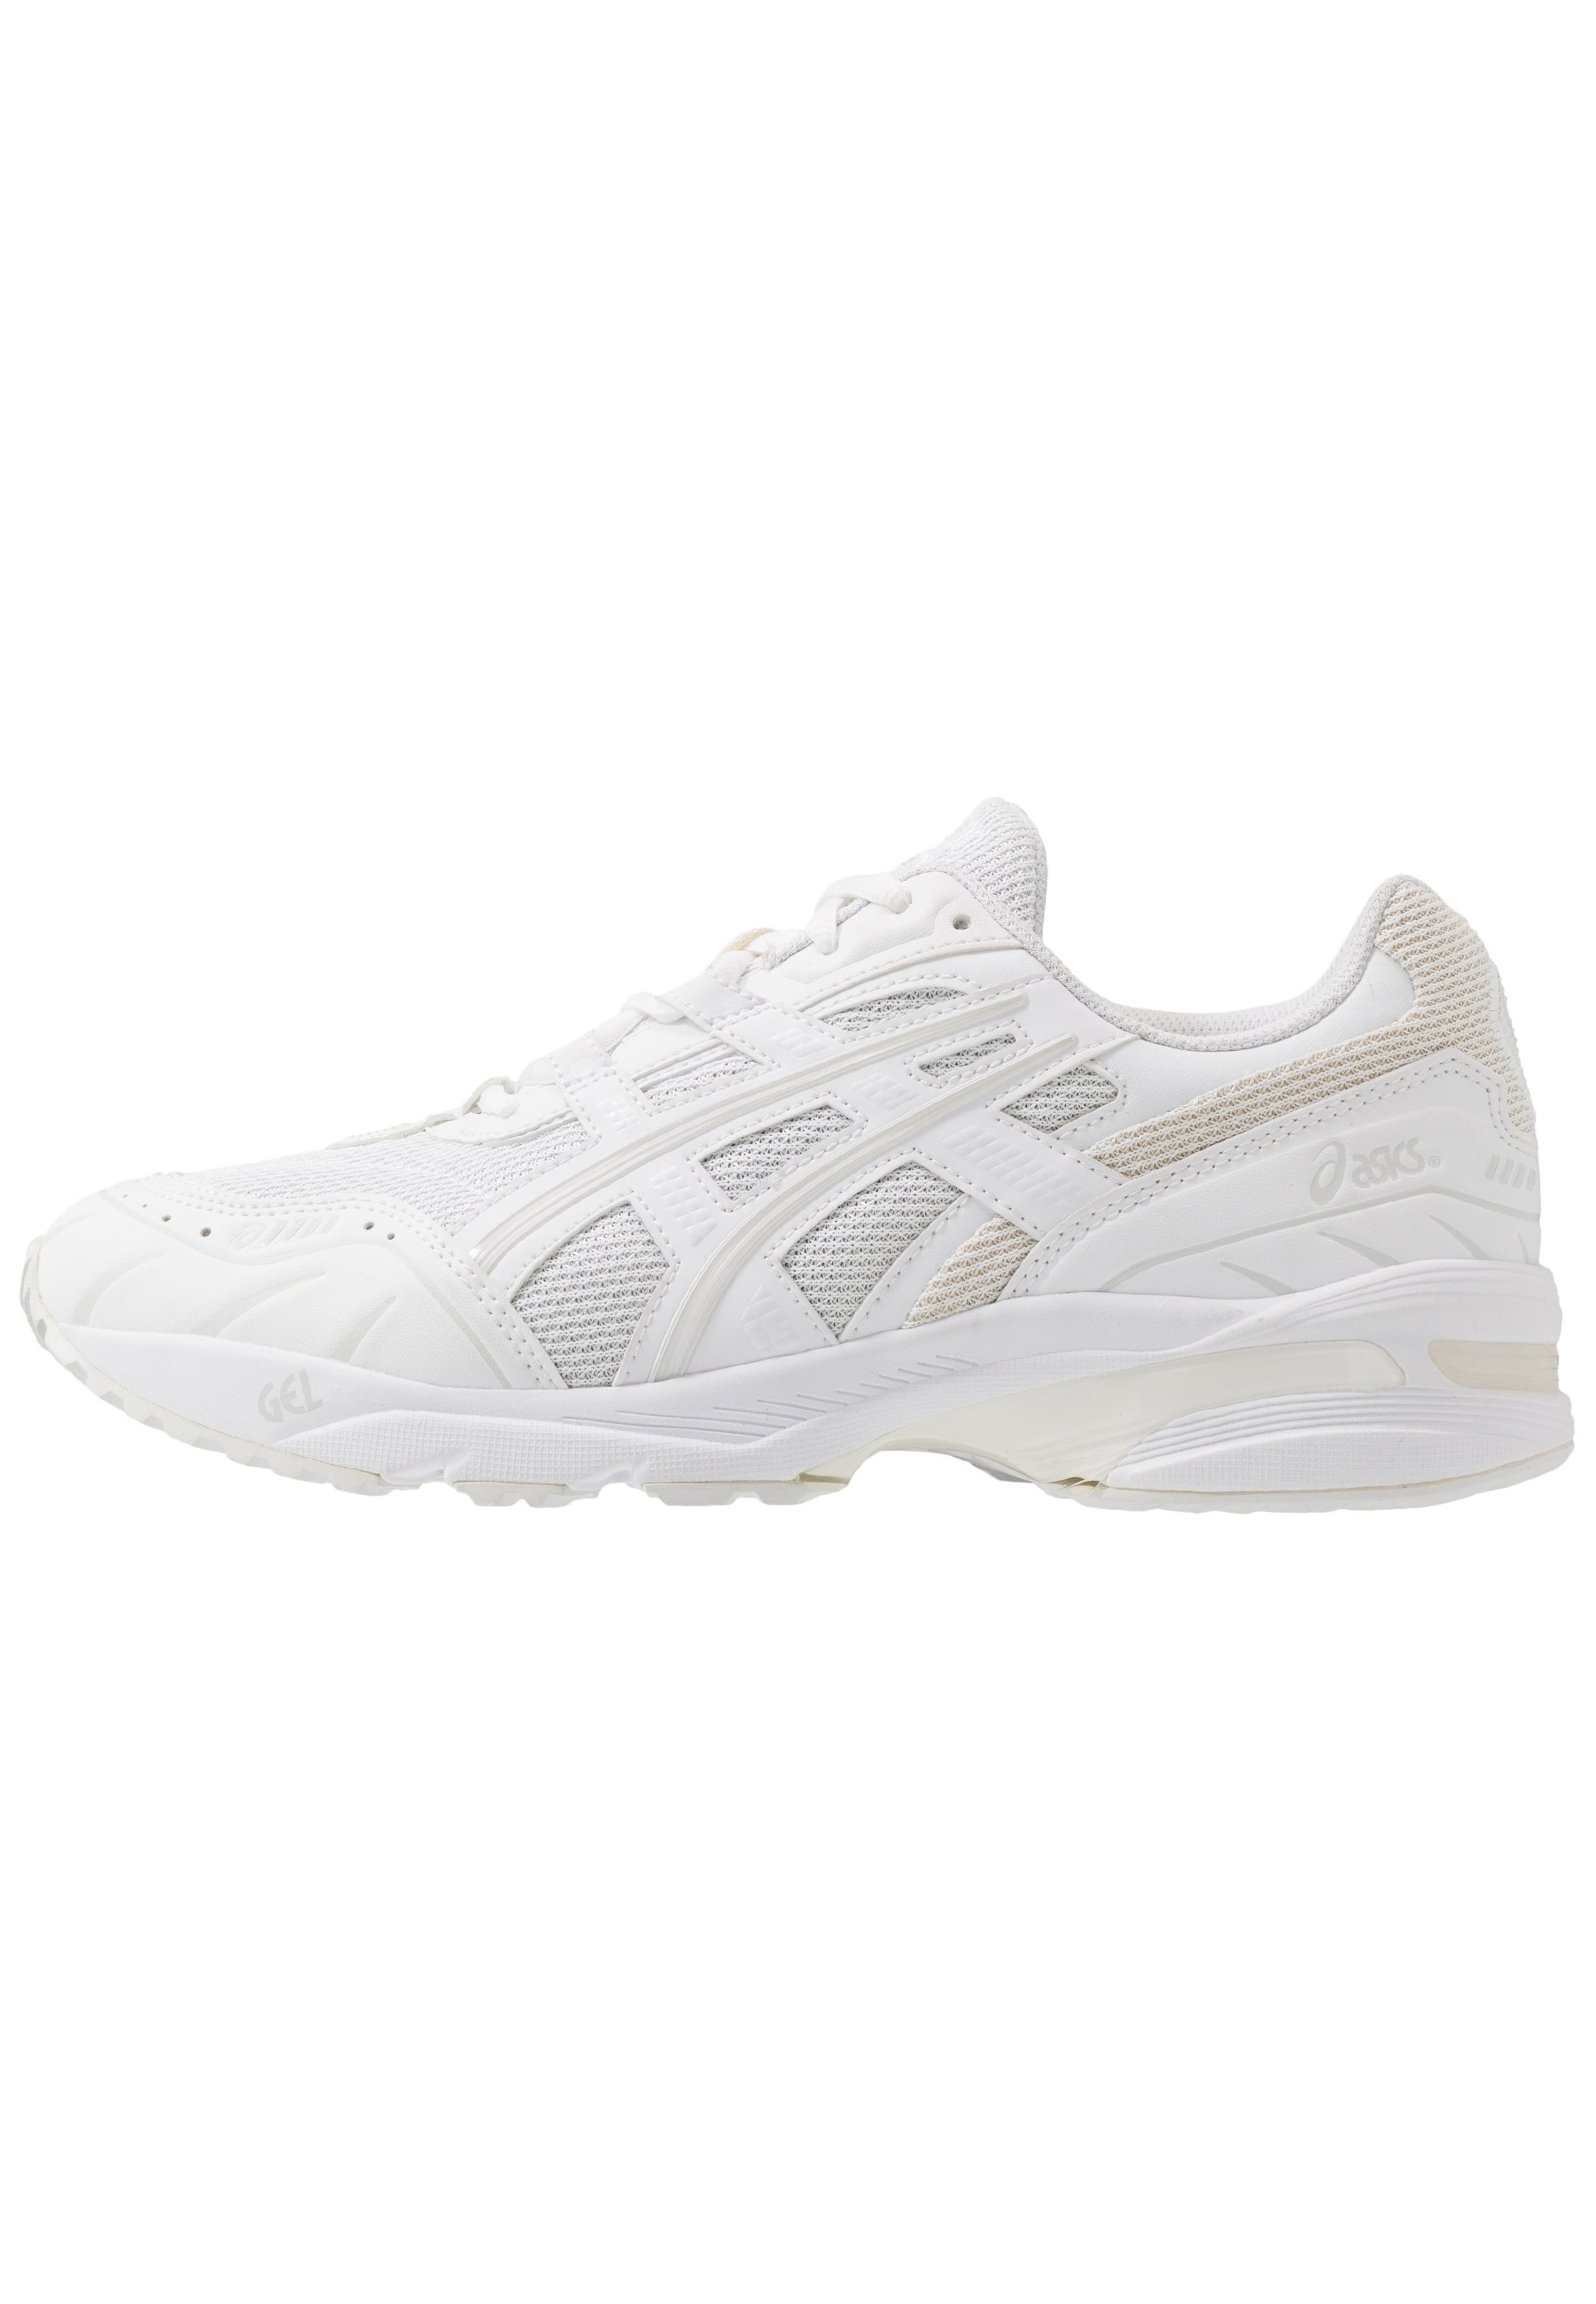 GEL-1090 UNISEX - Trainers - white